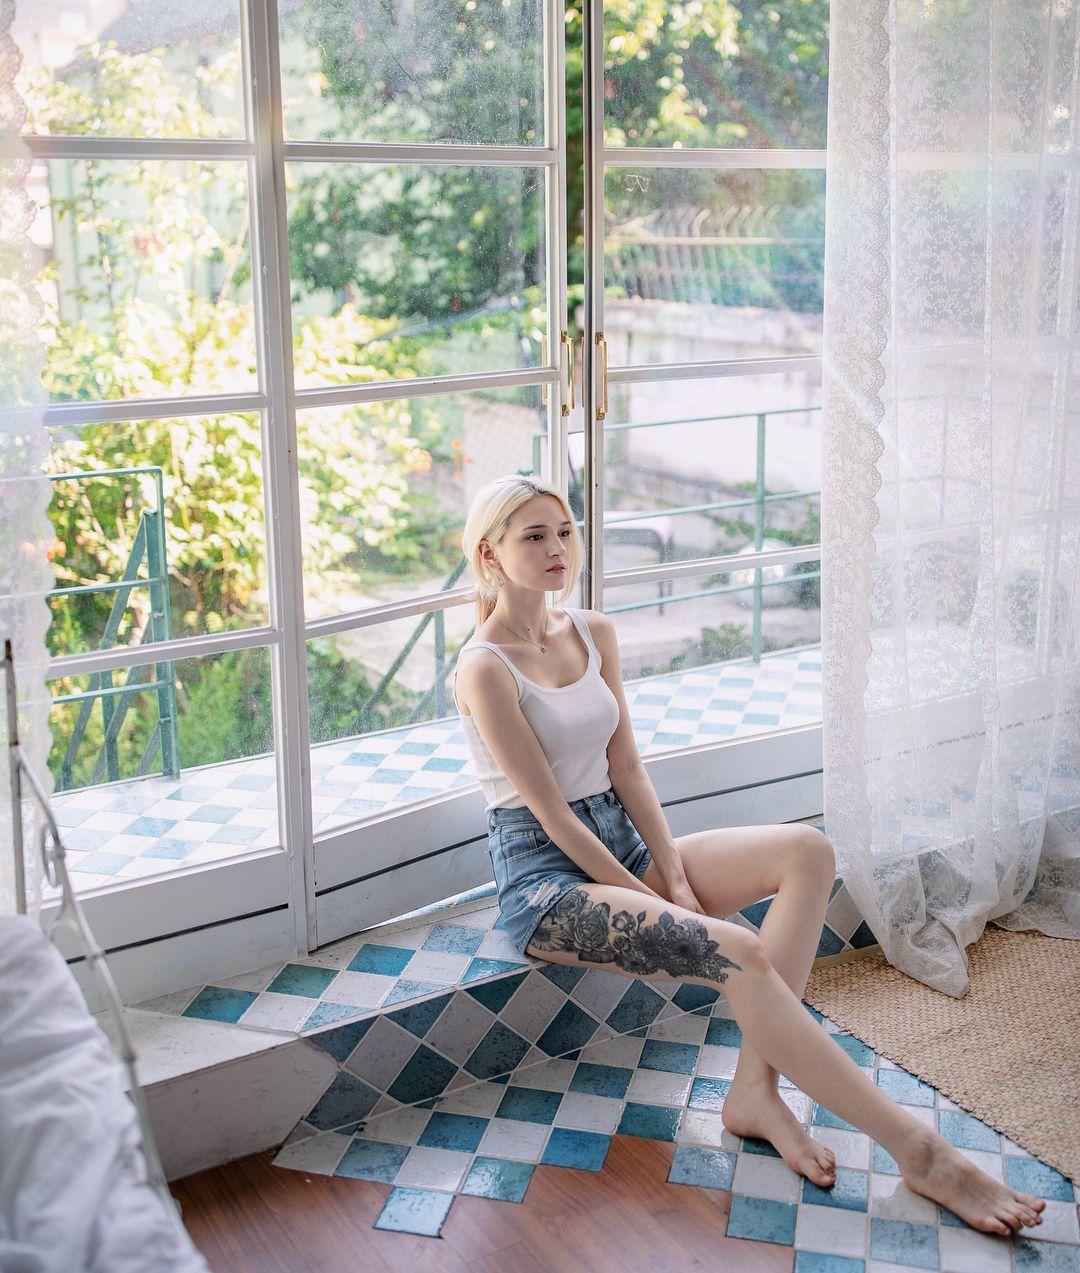 Anastasia-Jung-Wallpapers-Insta-Fit-Bio-11